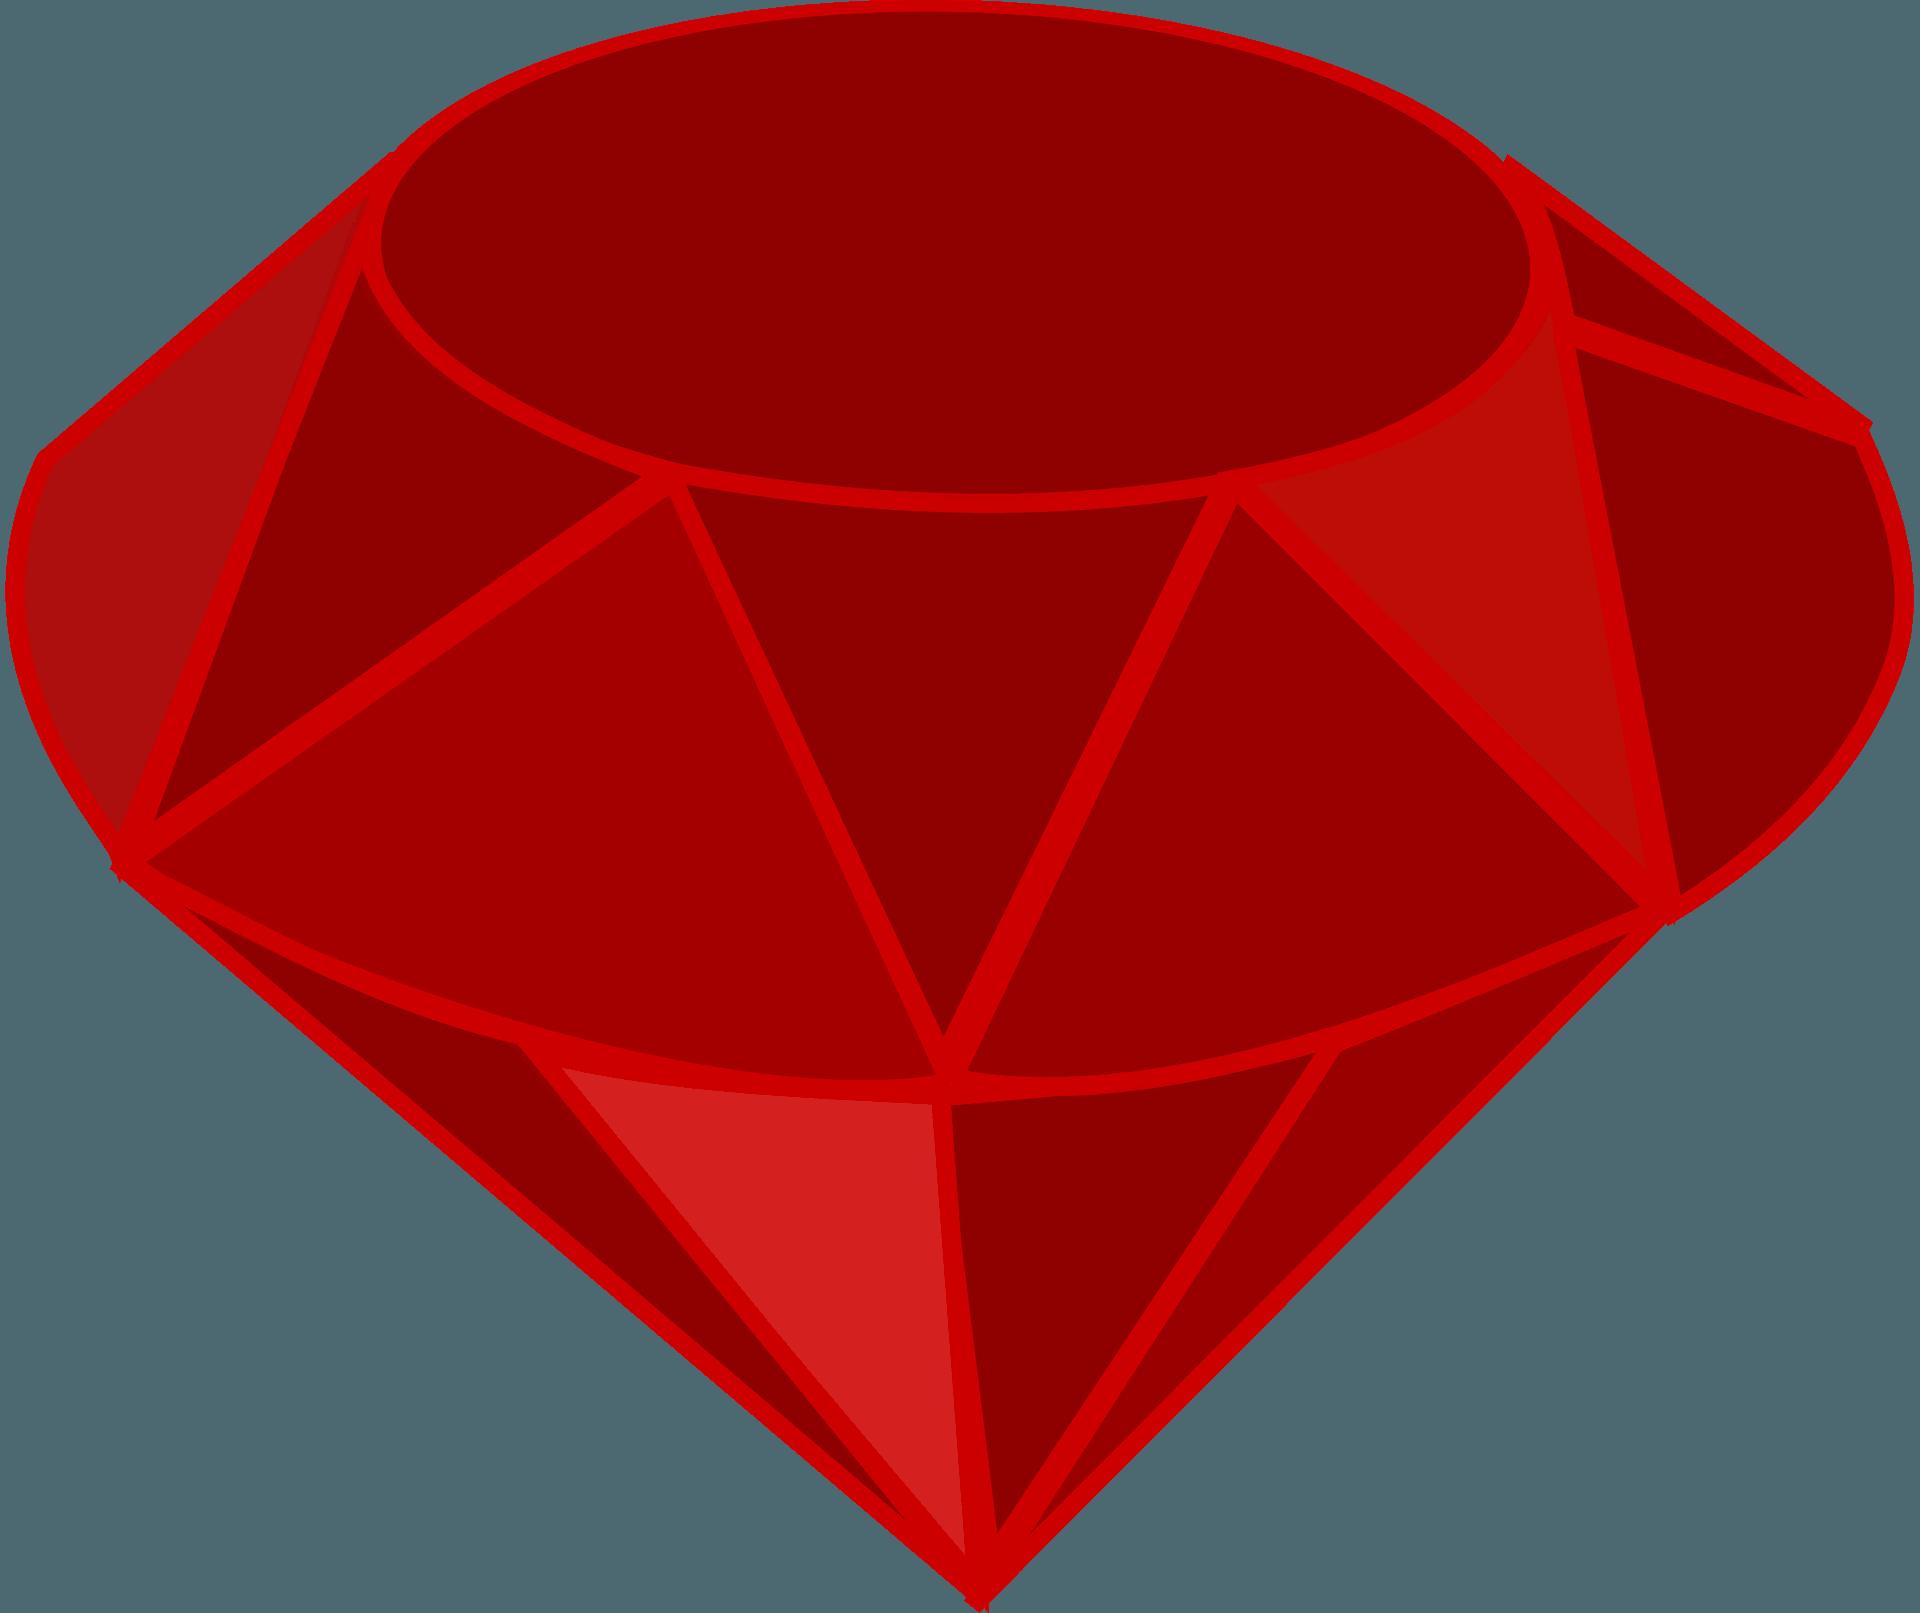 Ruby clipart. Free download transparent .PNG | Creazilla